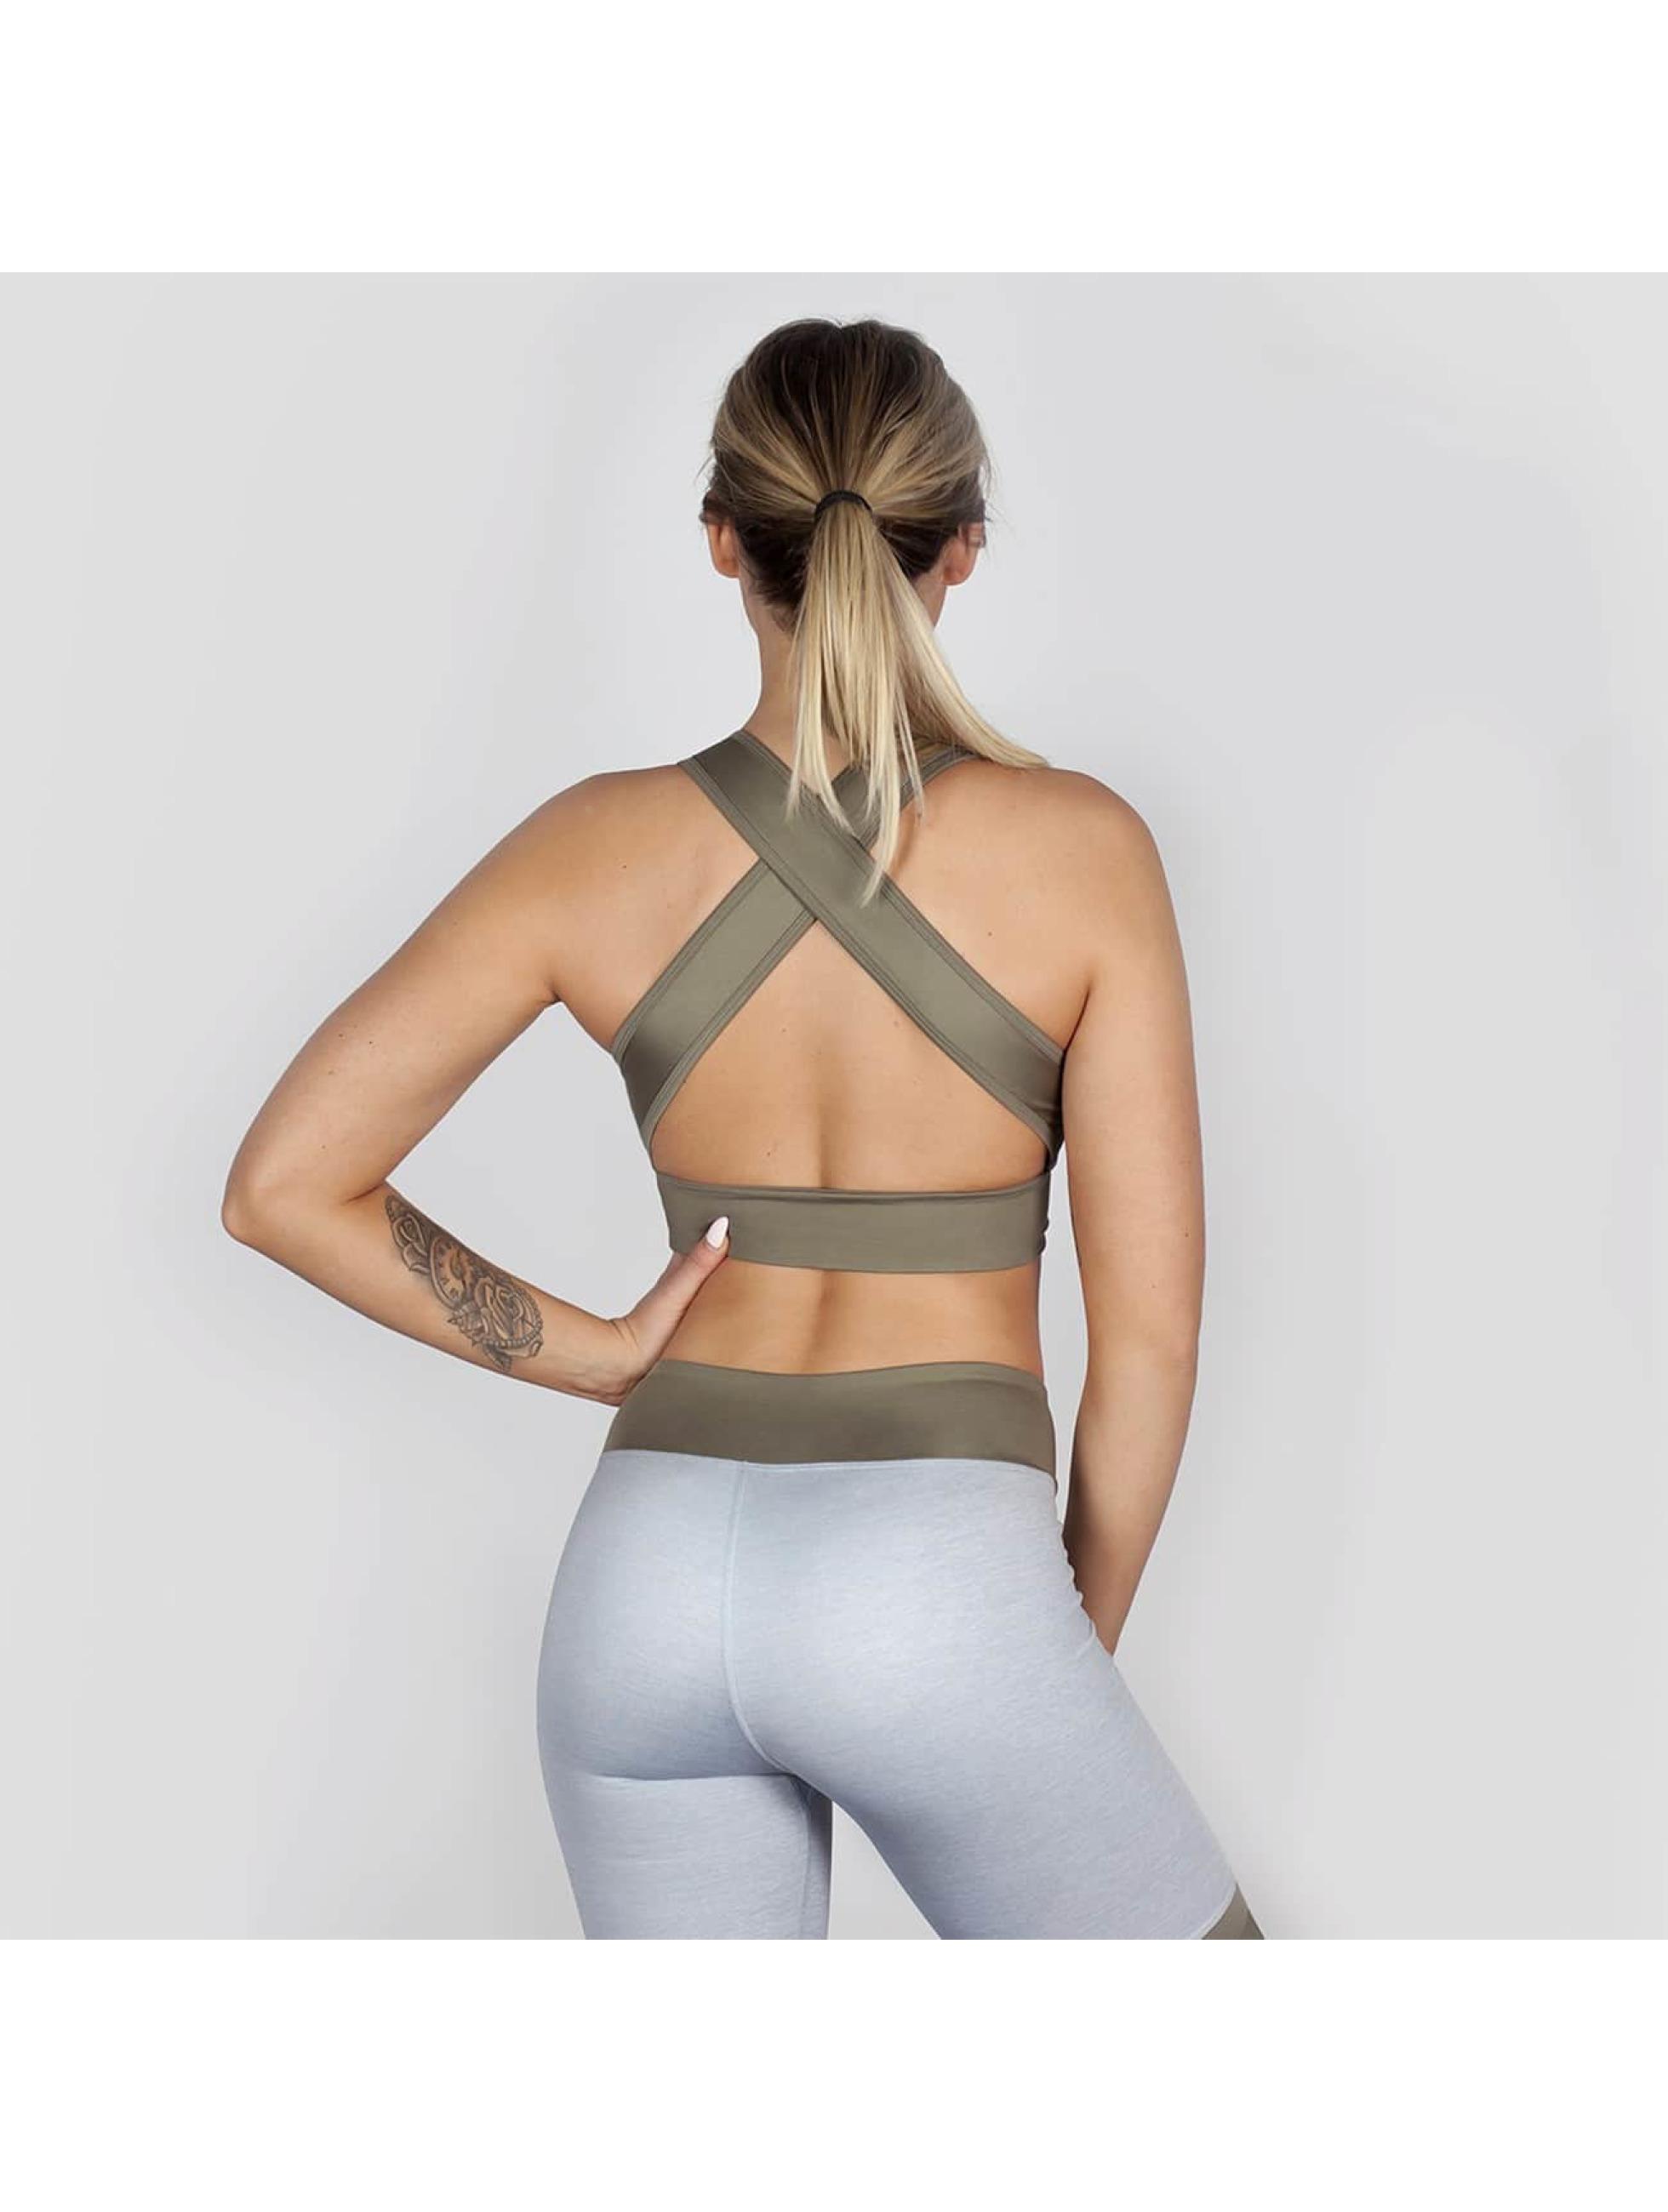 Beyond Limits Underwear Crossback gray